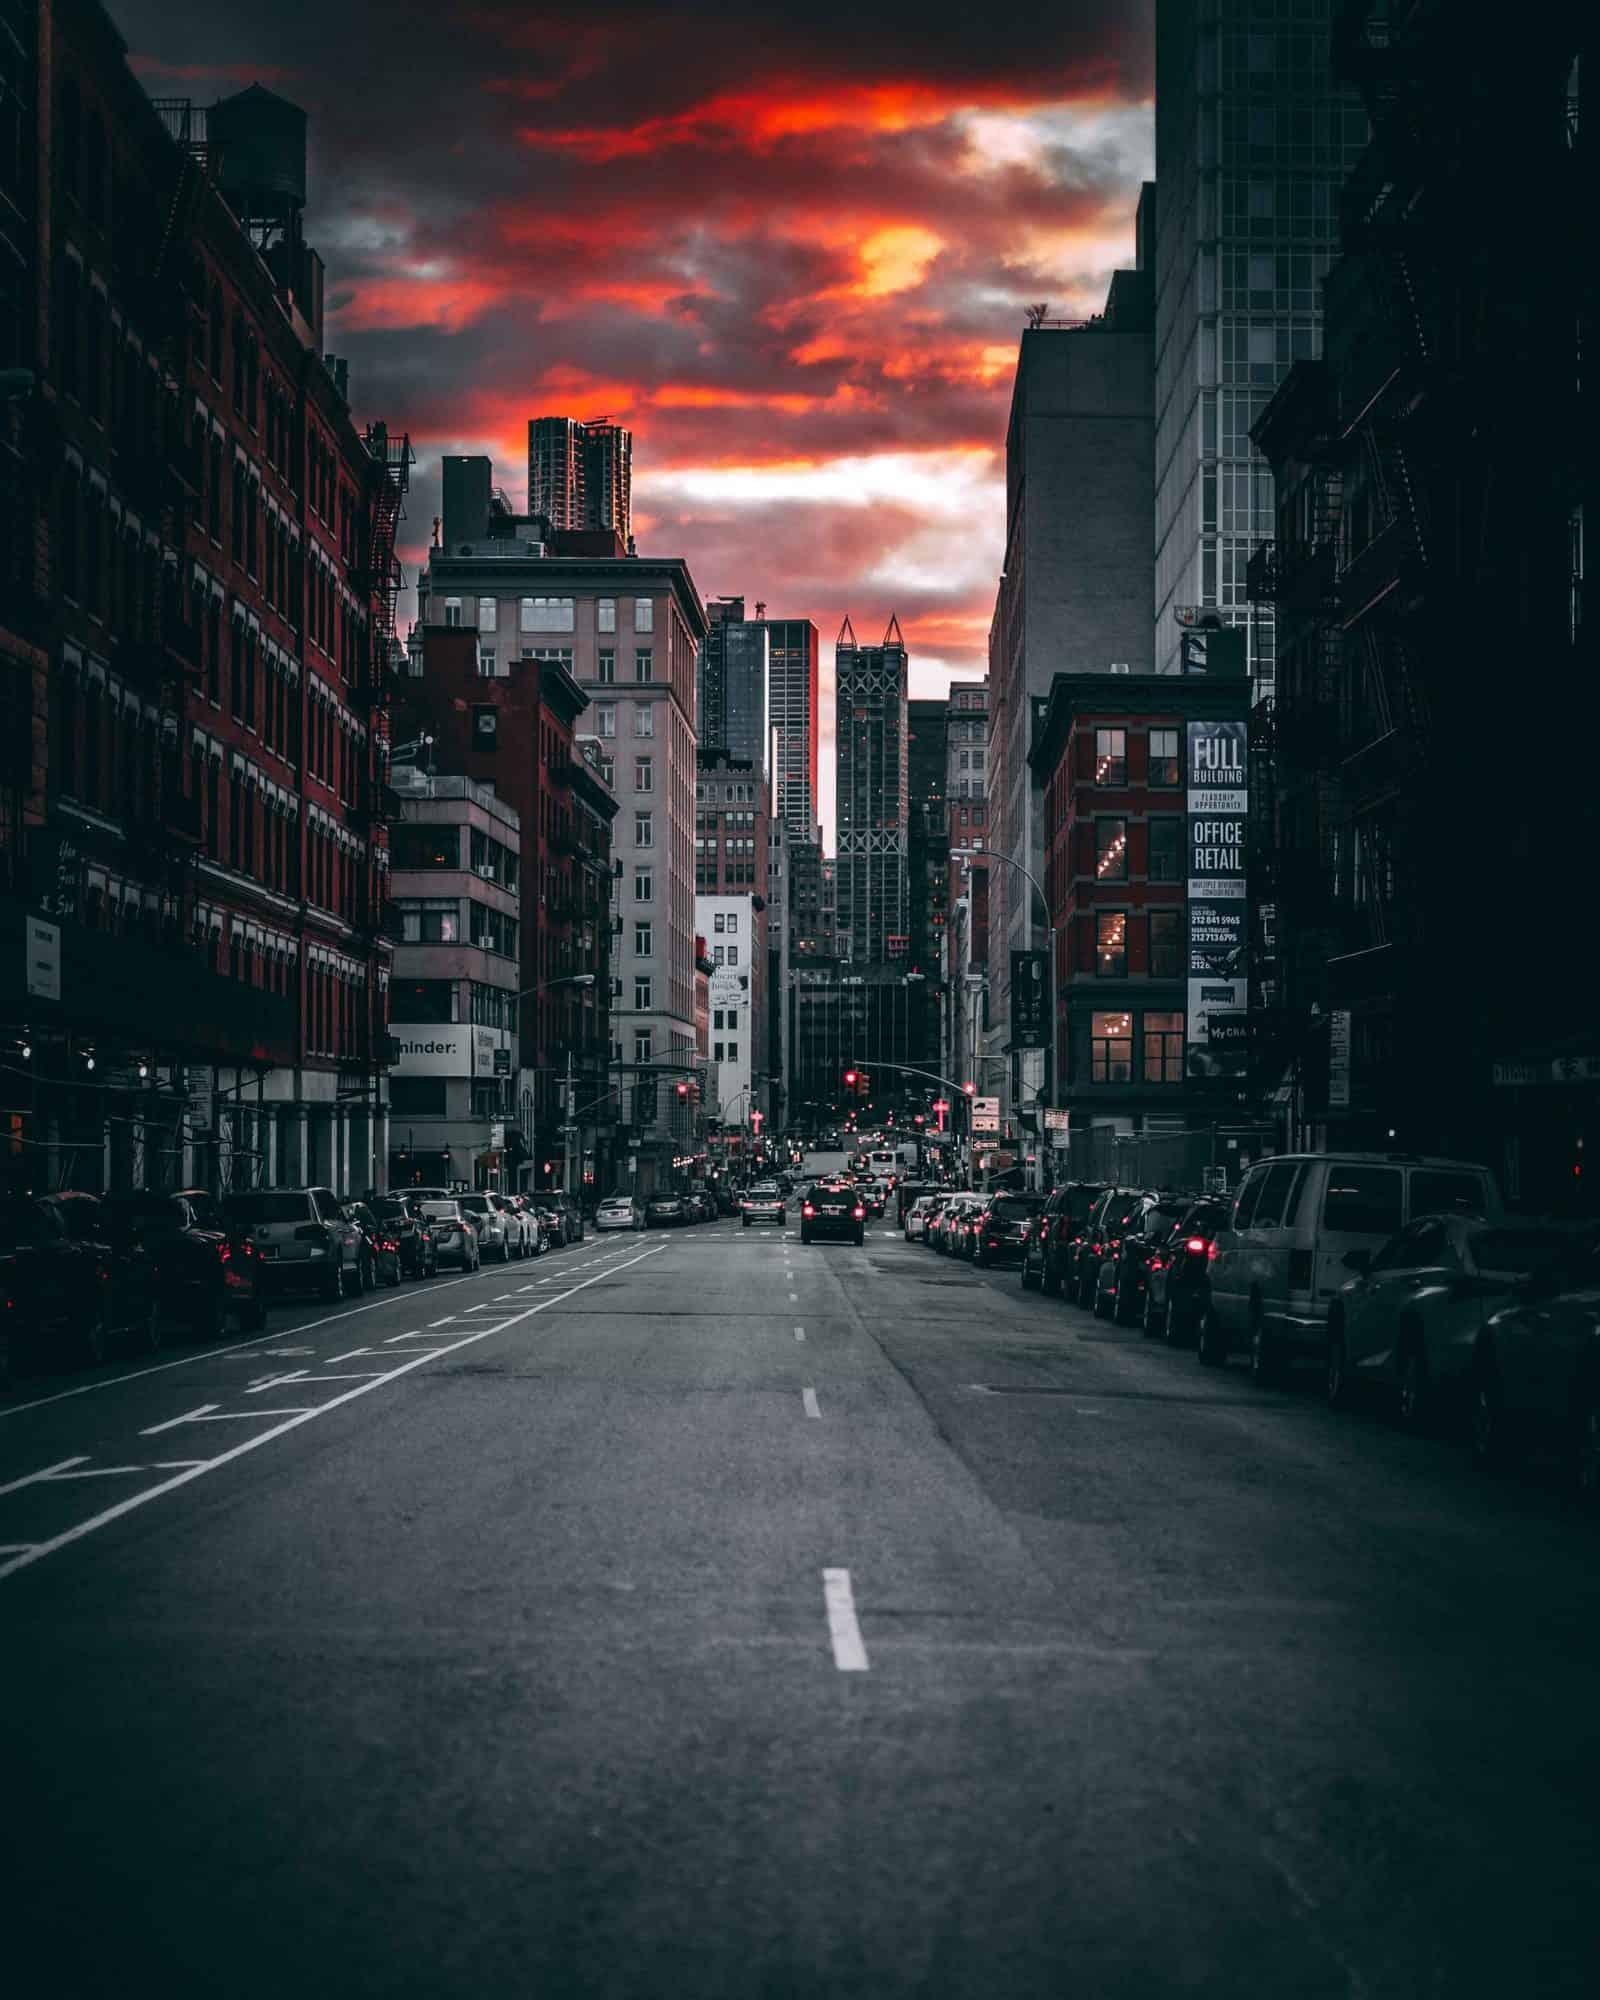 Urban exodus